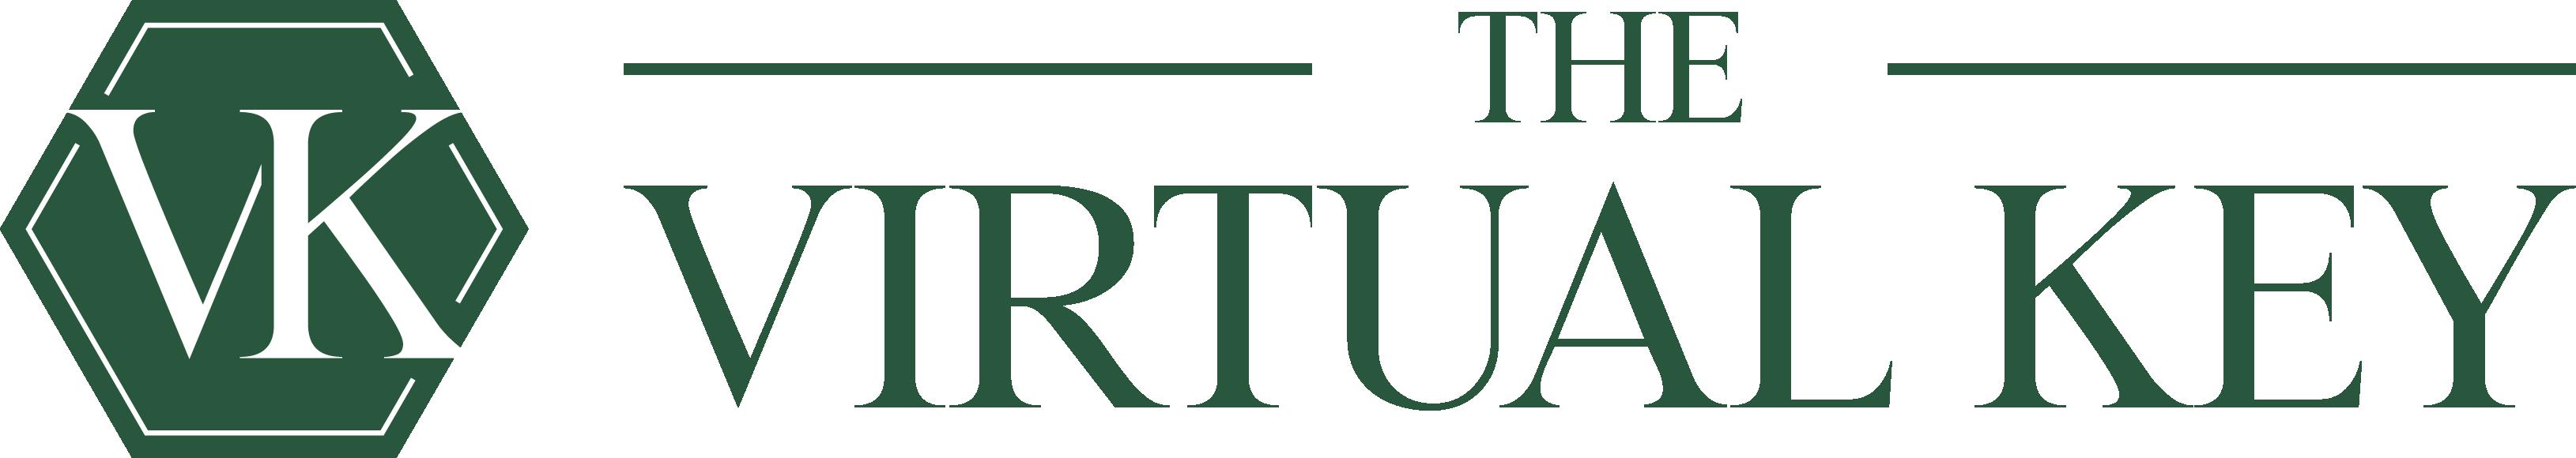 The Virtual Key, LLC logo